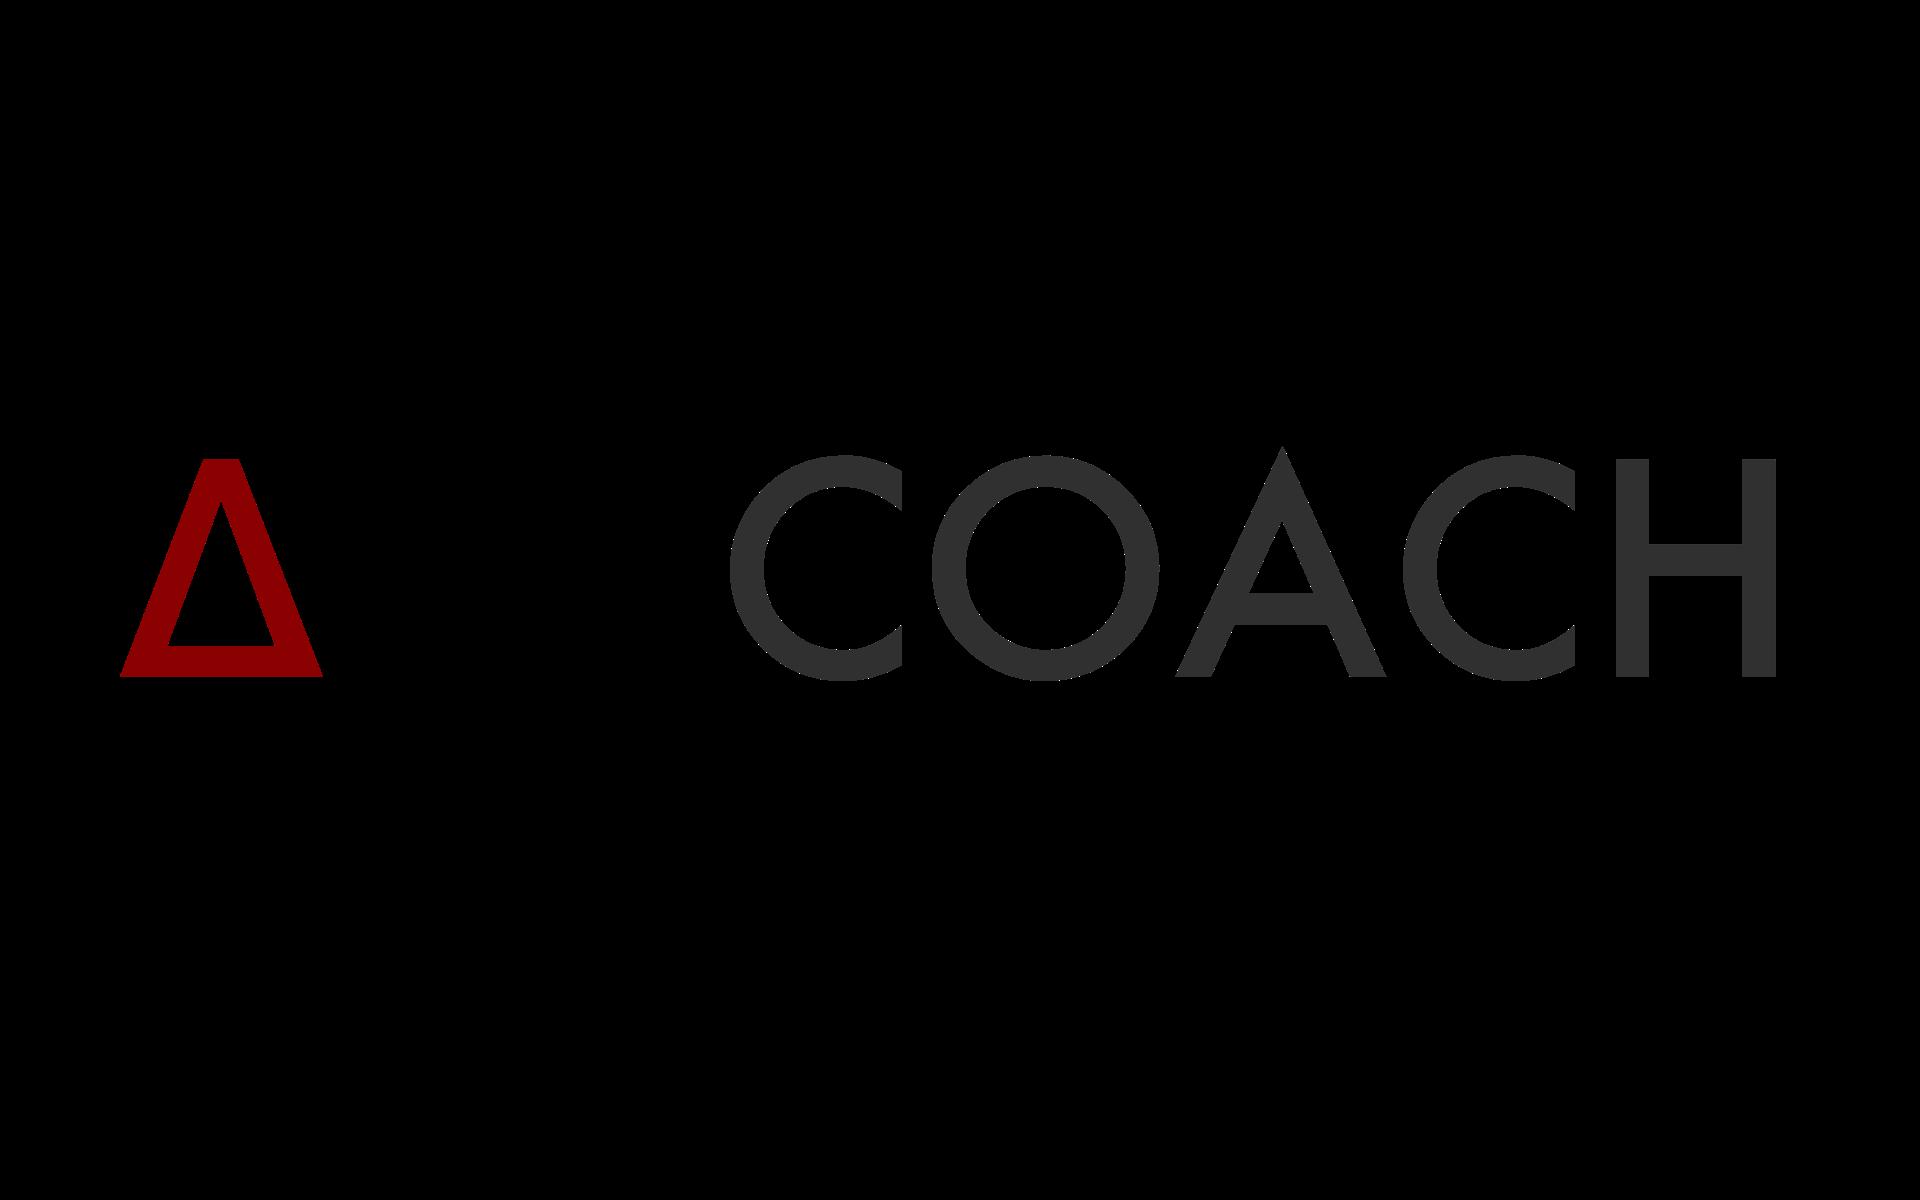 Initial coaching consultation